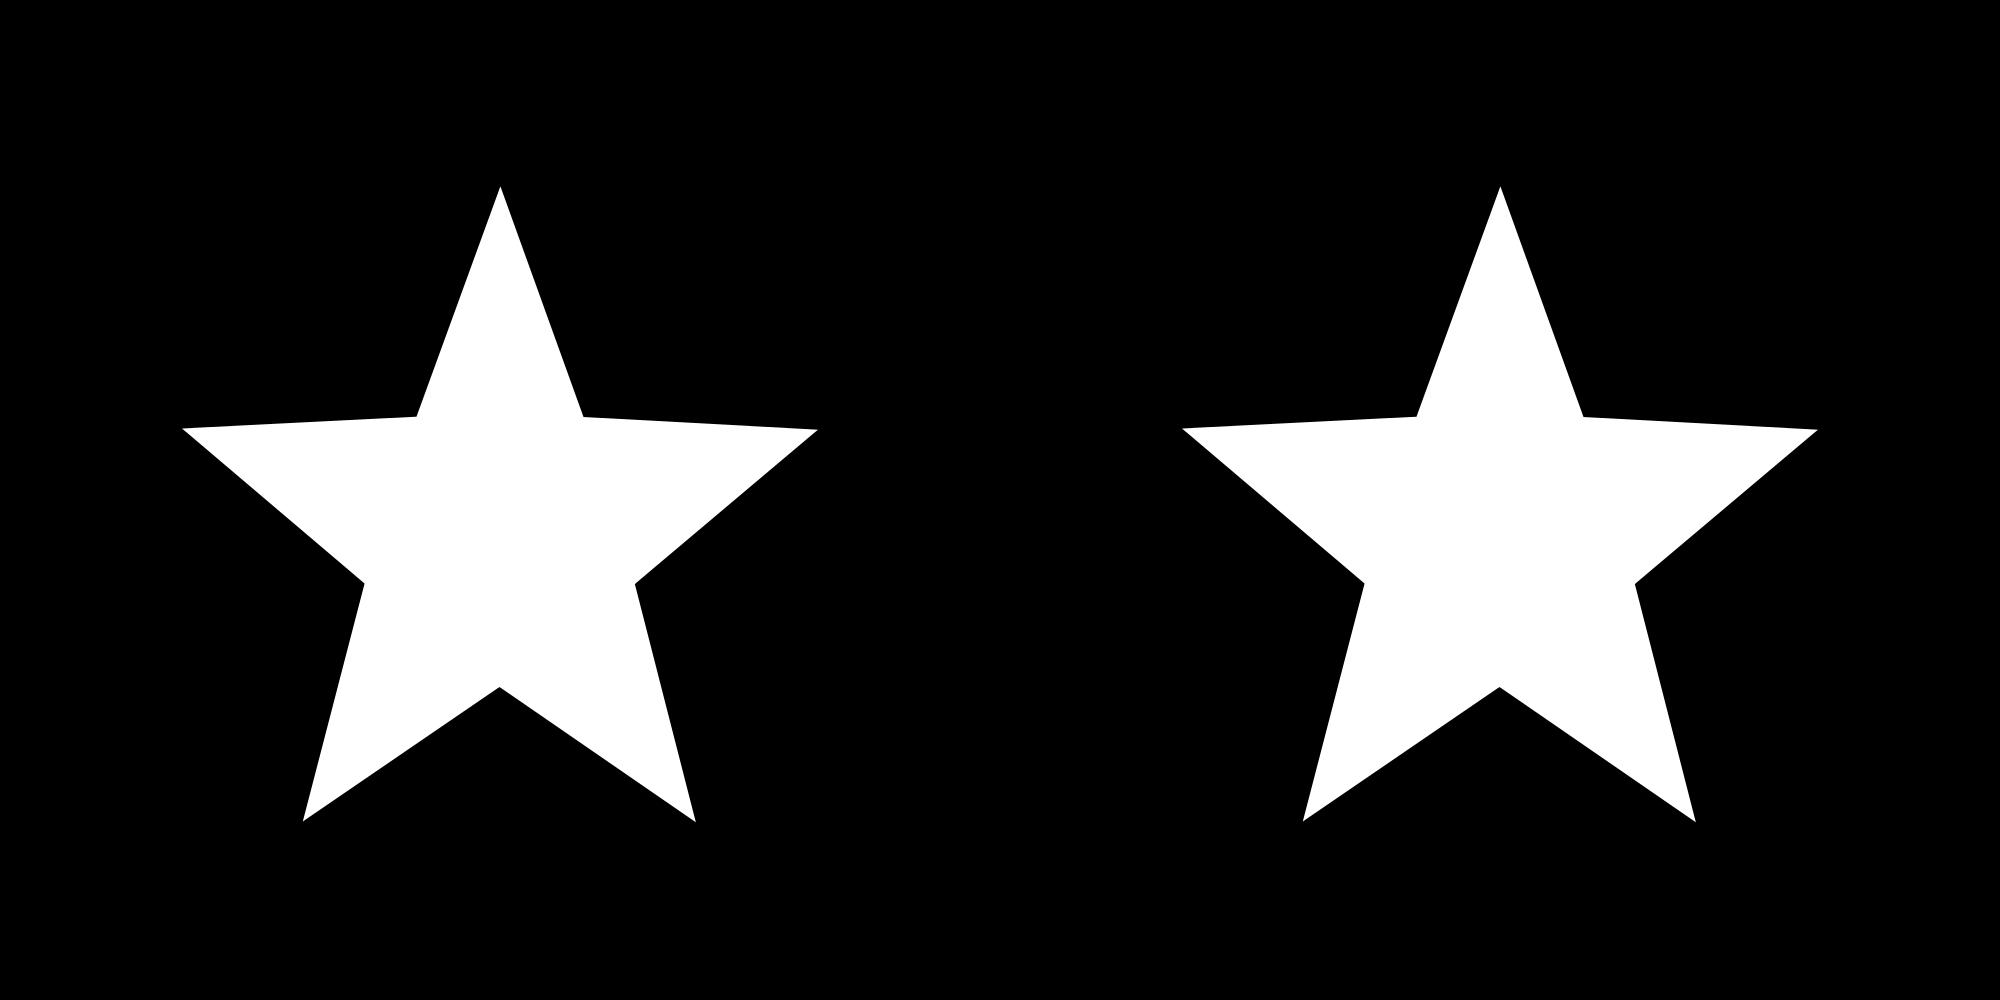 Clipart stars transparent background. File white svg wikimedia